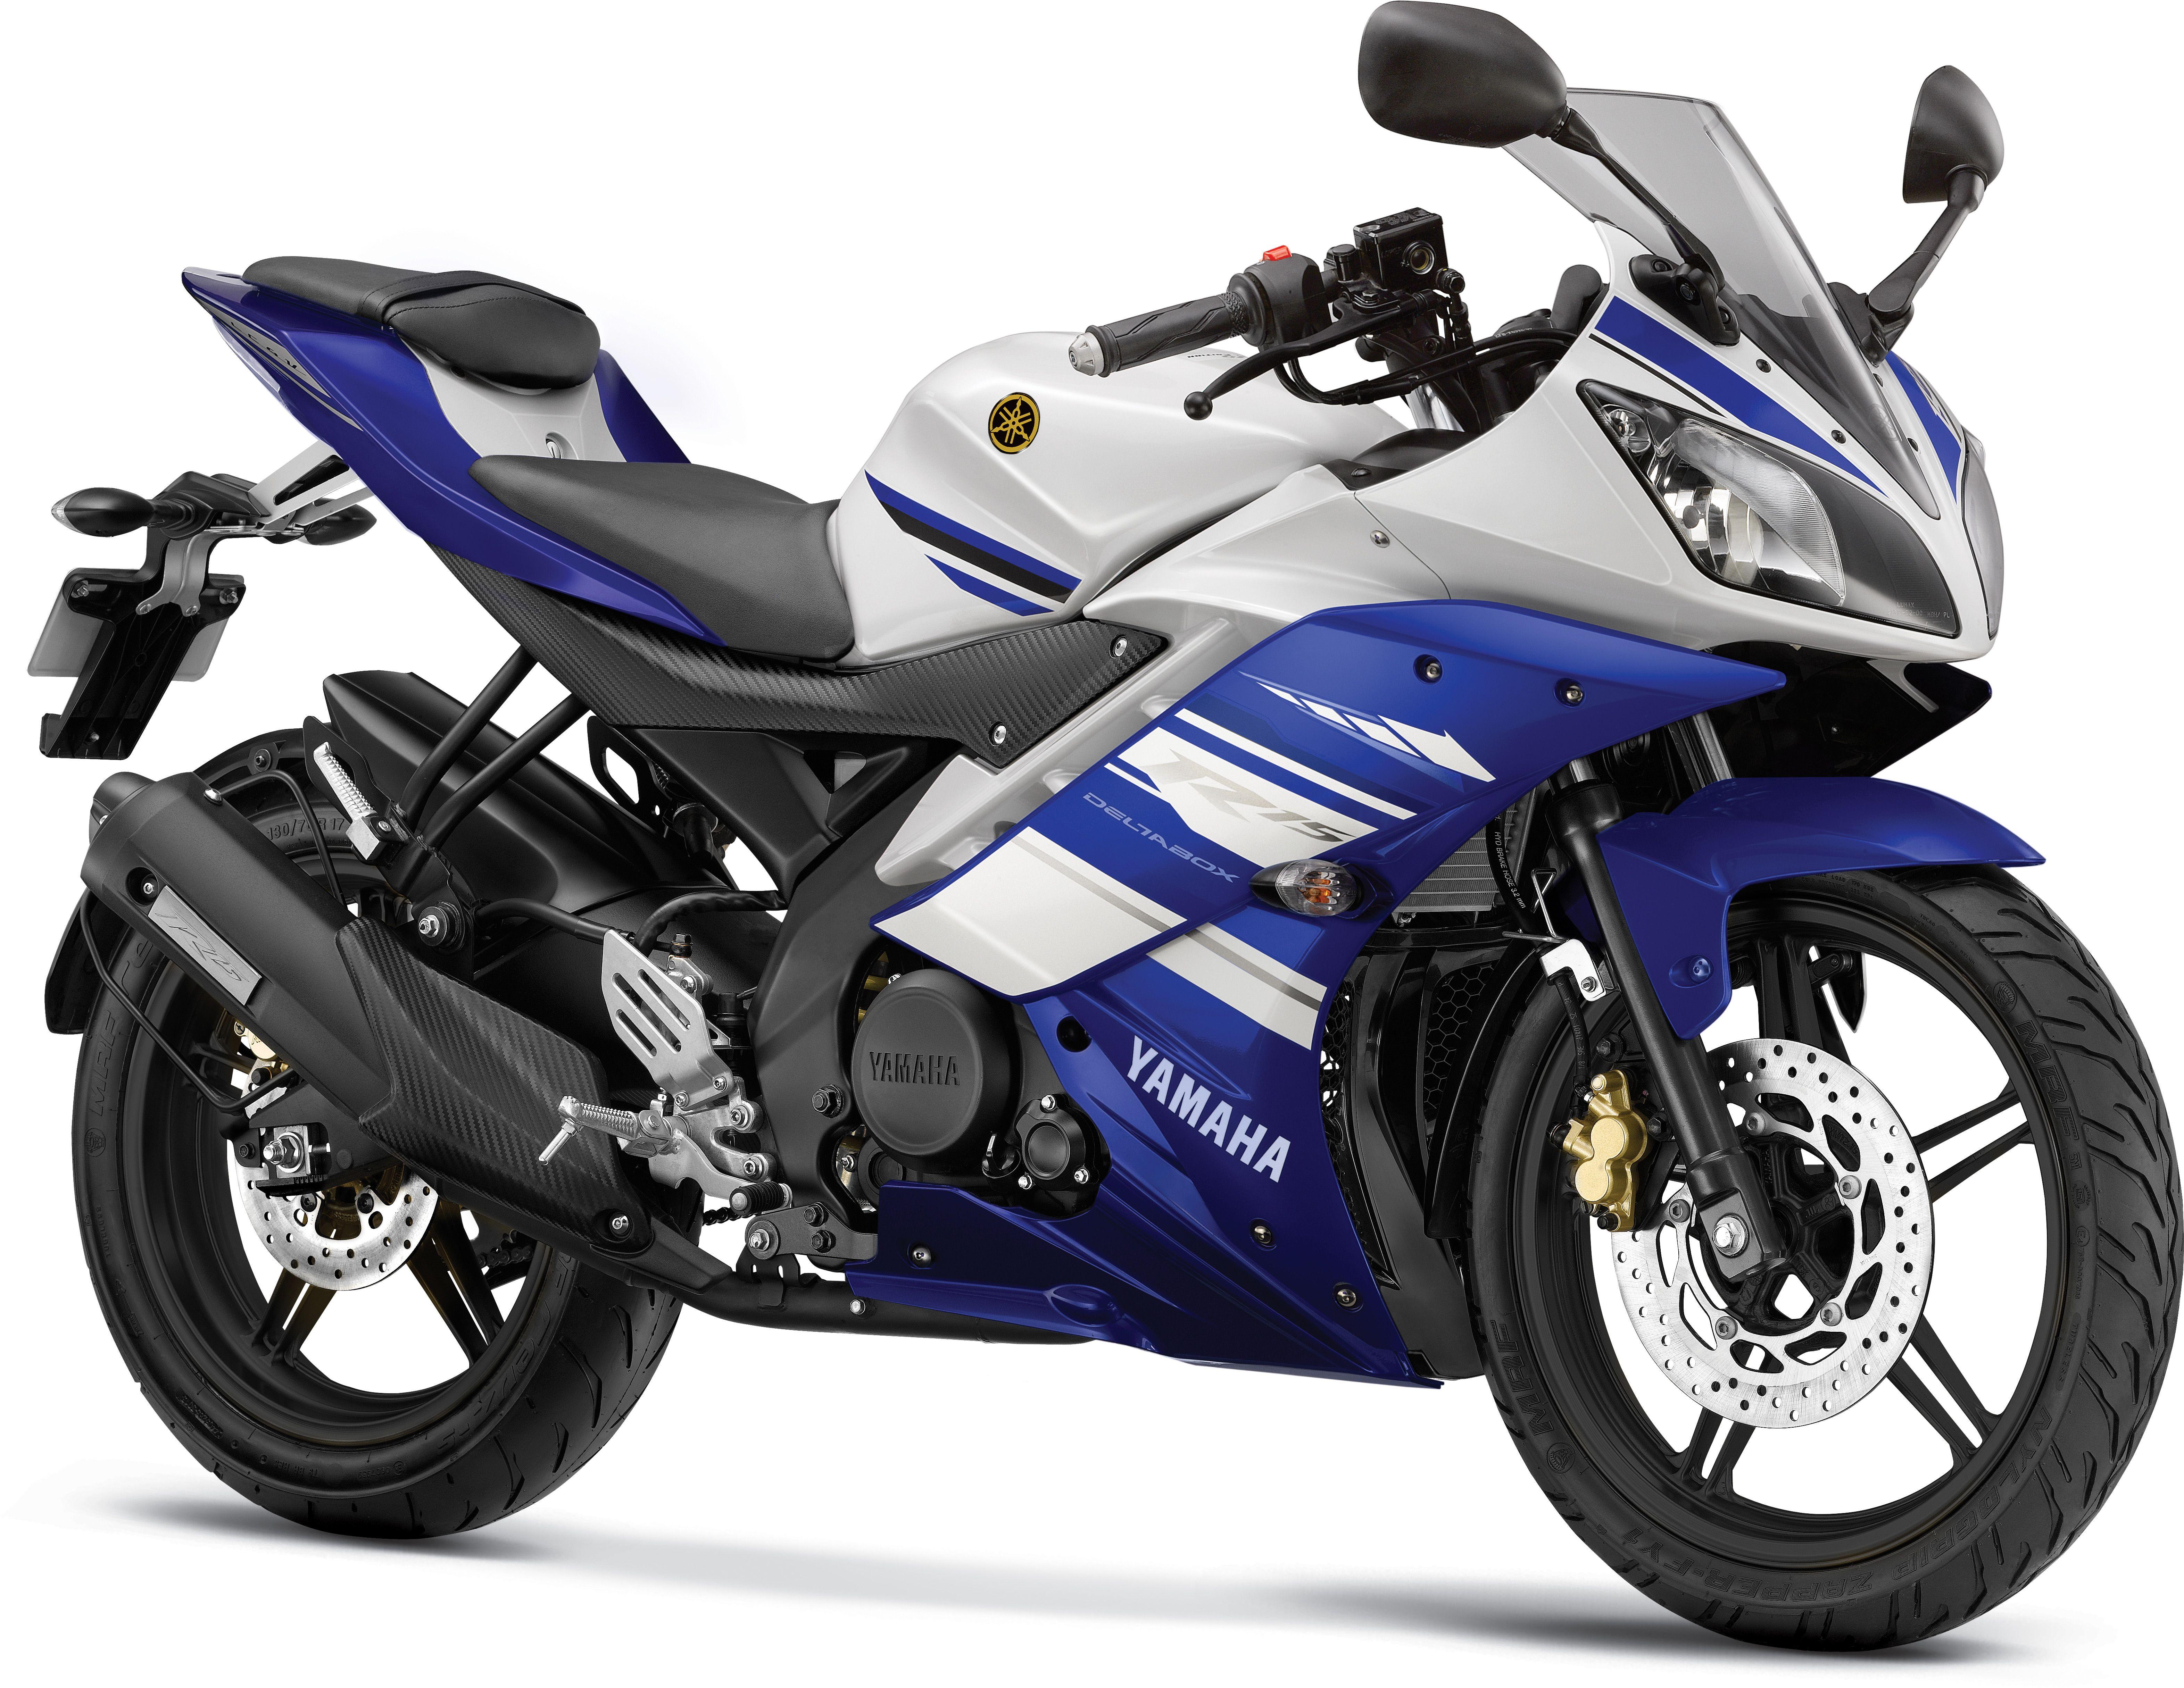 R15 v2.0 Racing Blue Industri otomotif, Sepeda motor